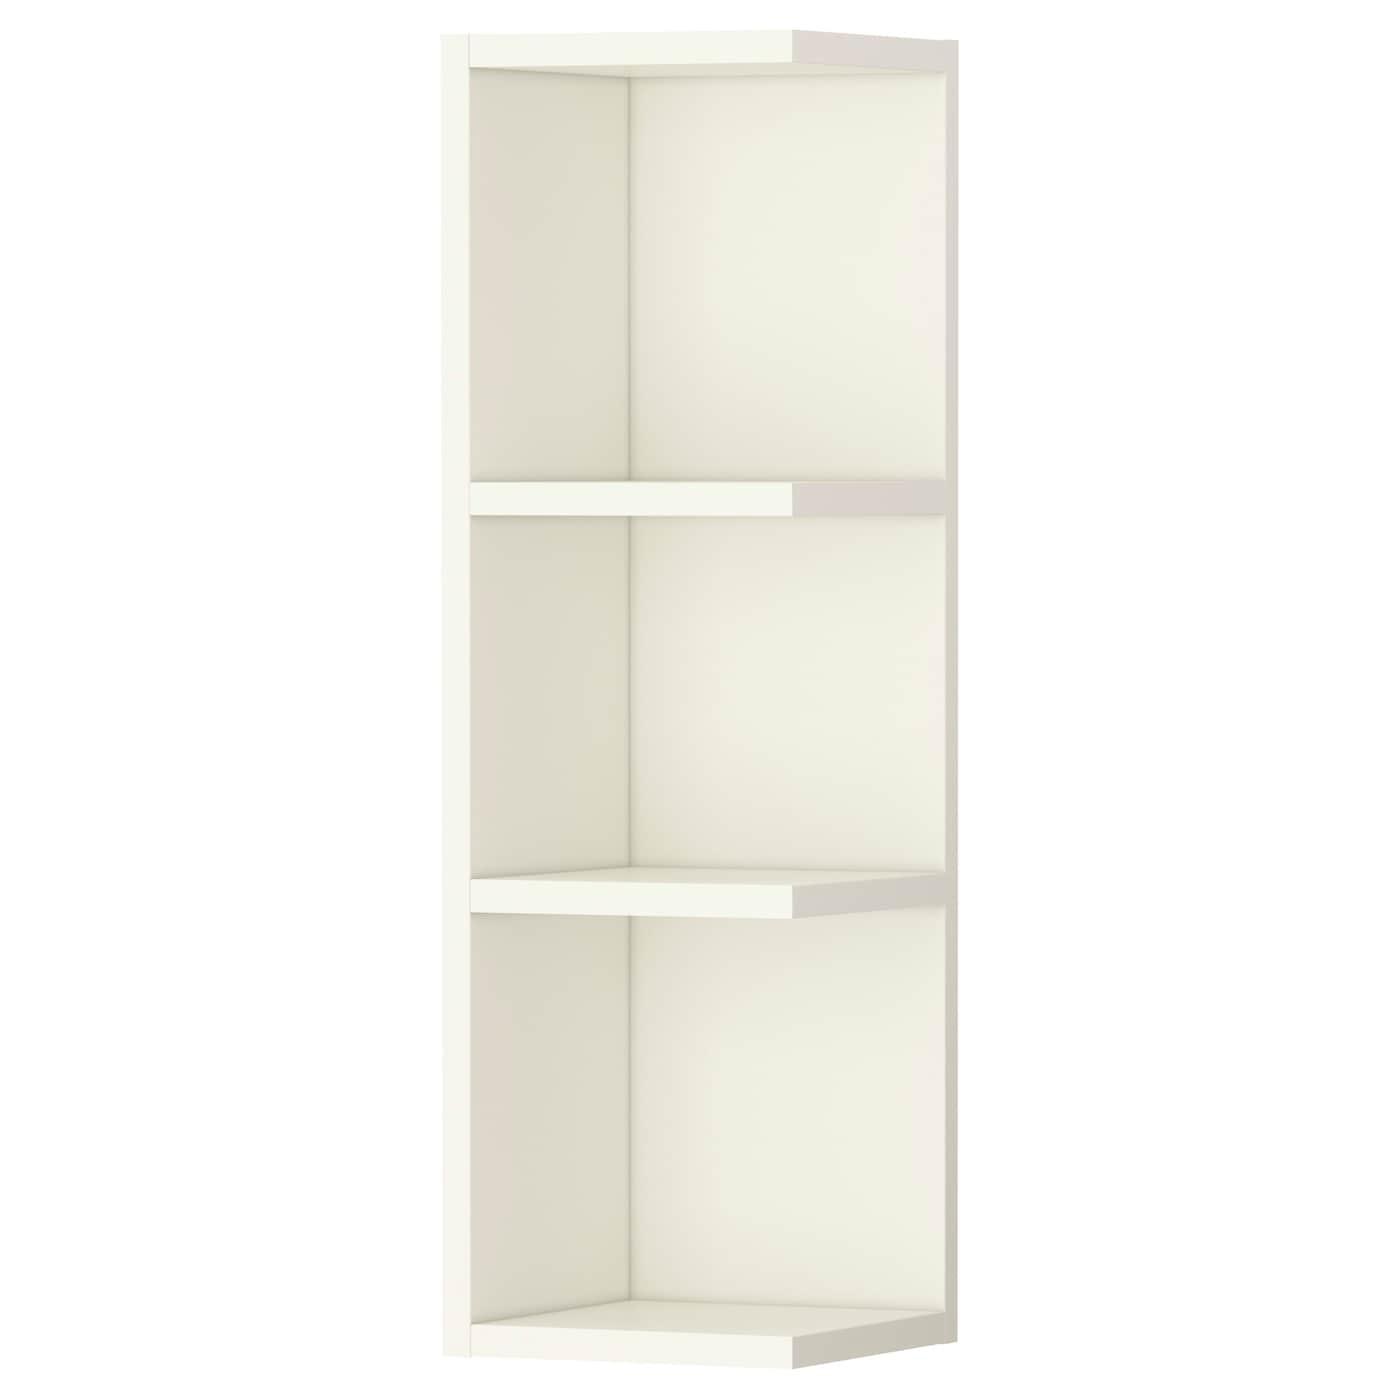 Bathroom Cabinets & Storage Furniture